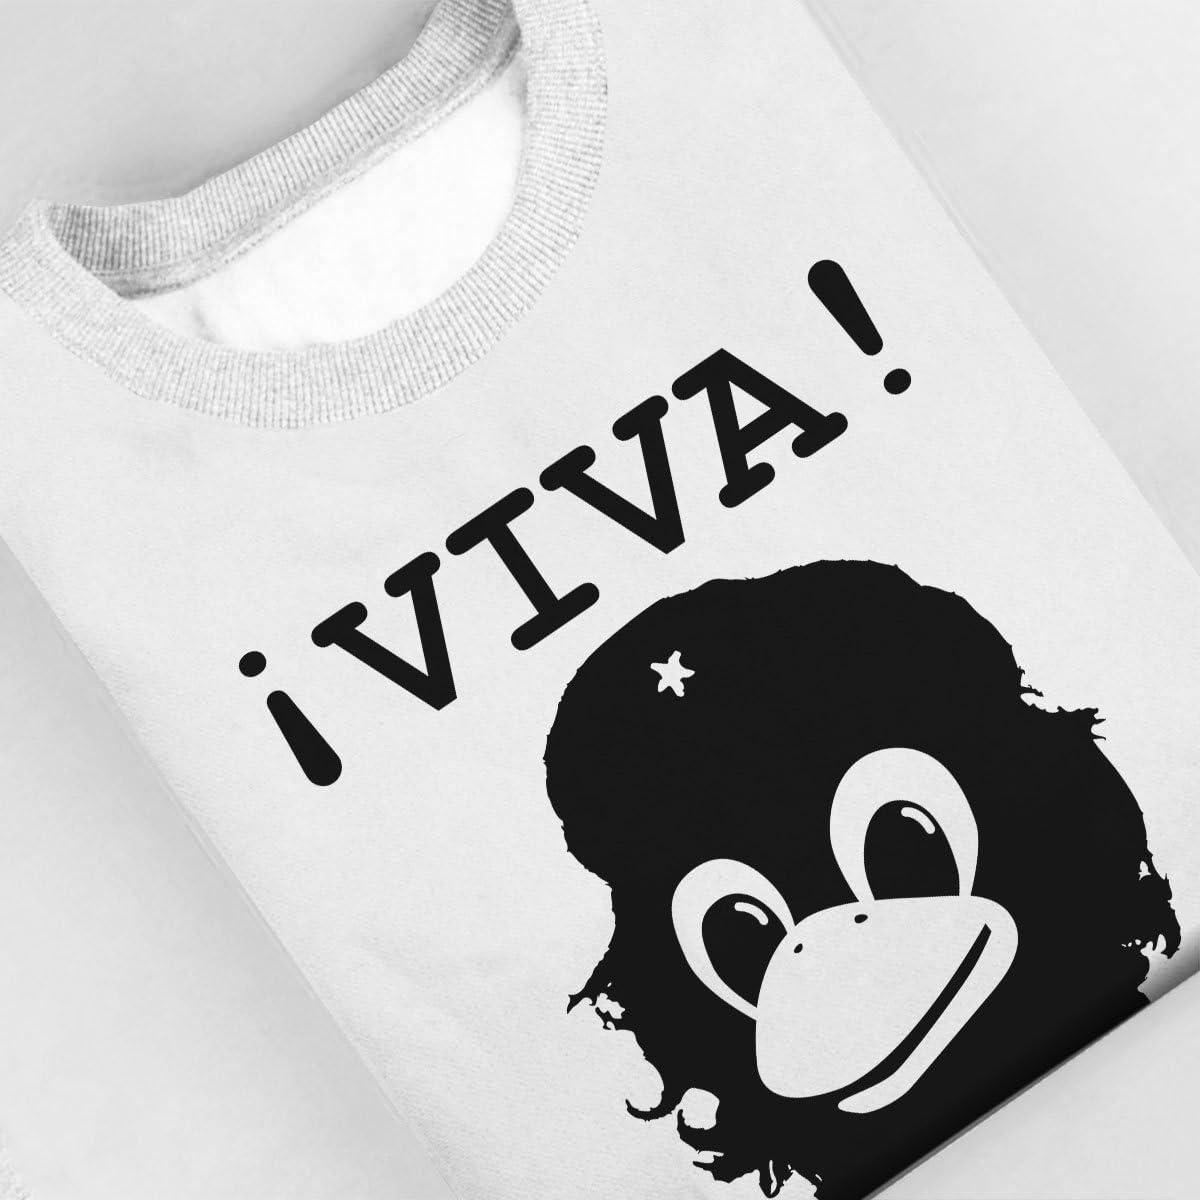 Viva Programming Tux Linux Che Guevara Womens Sweatshirt